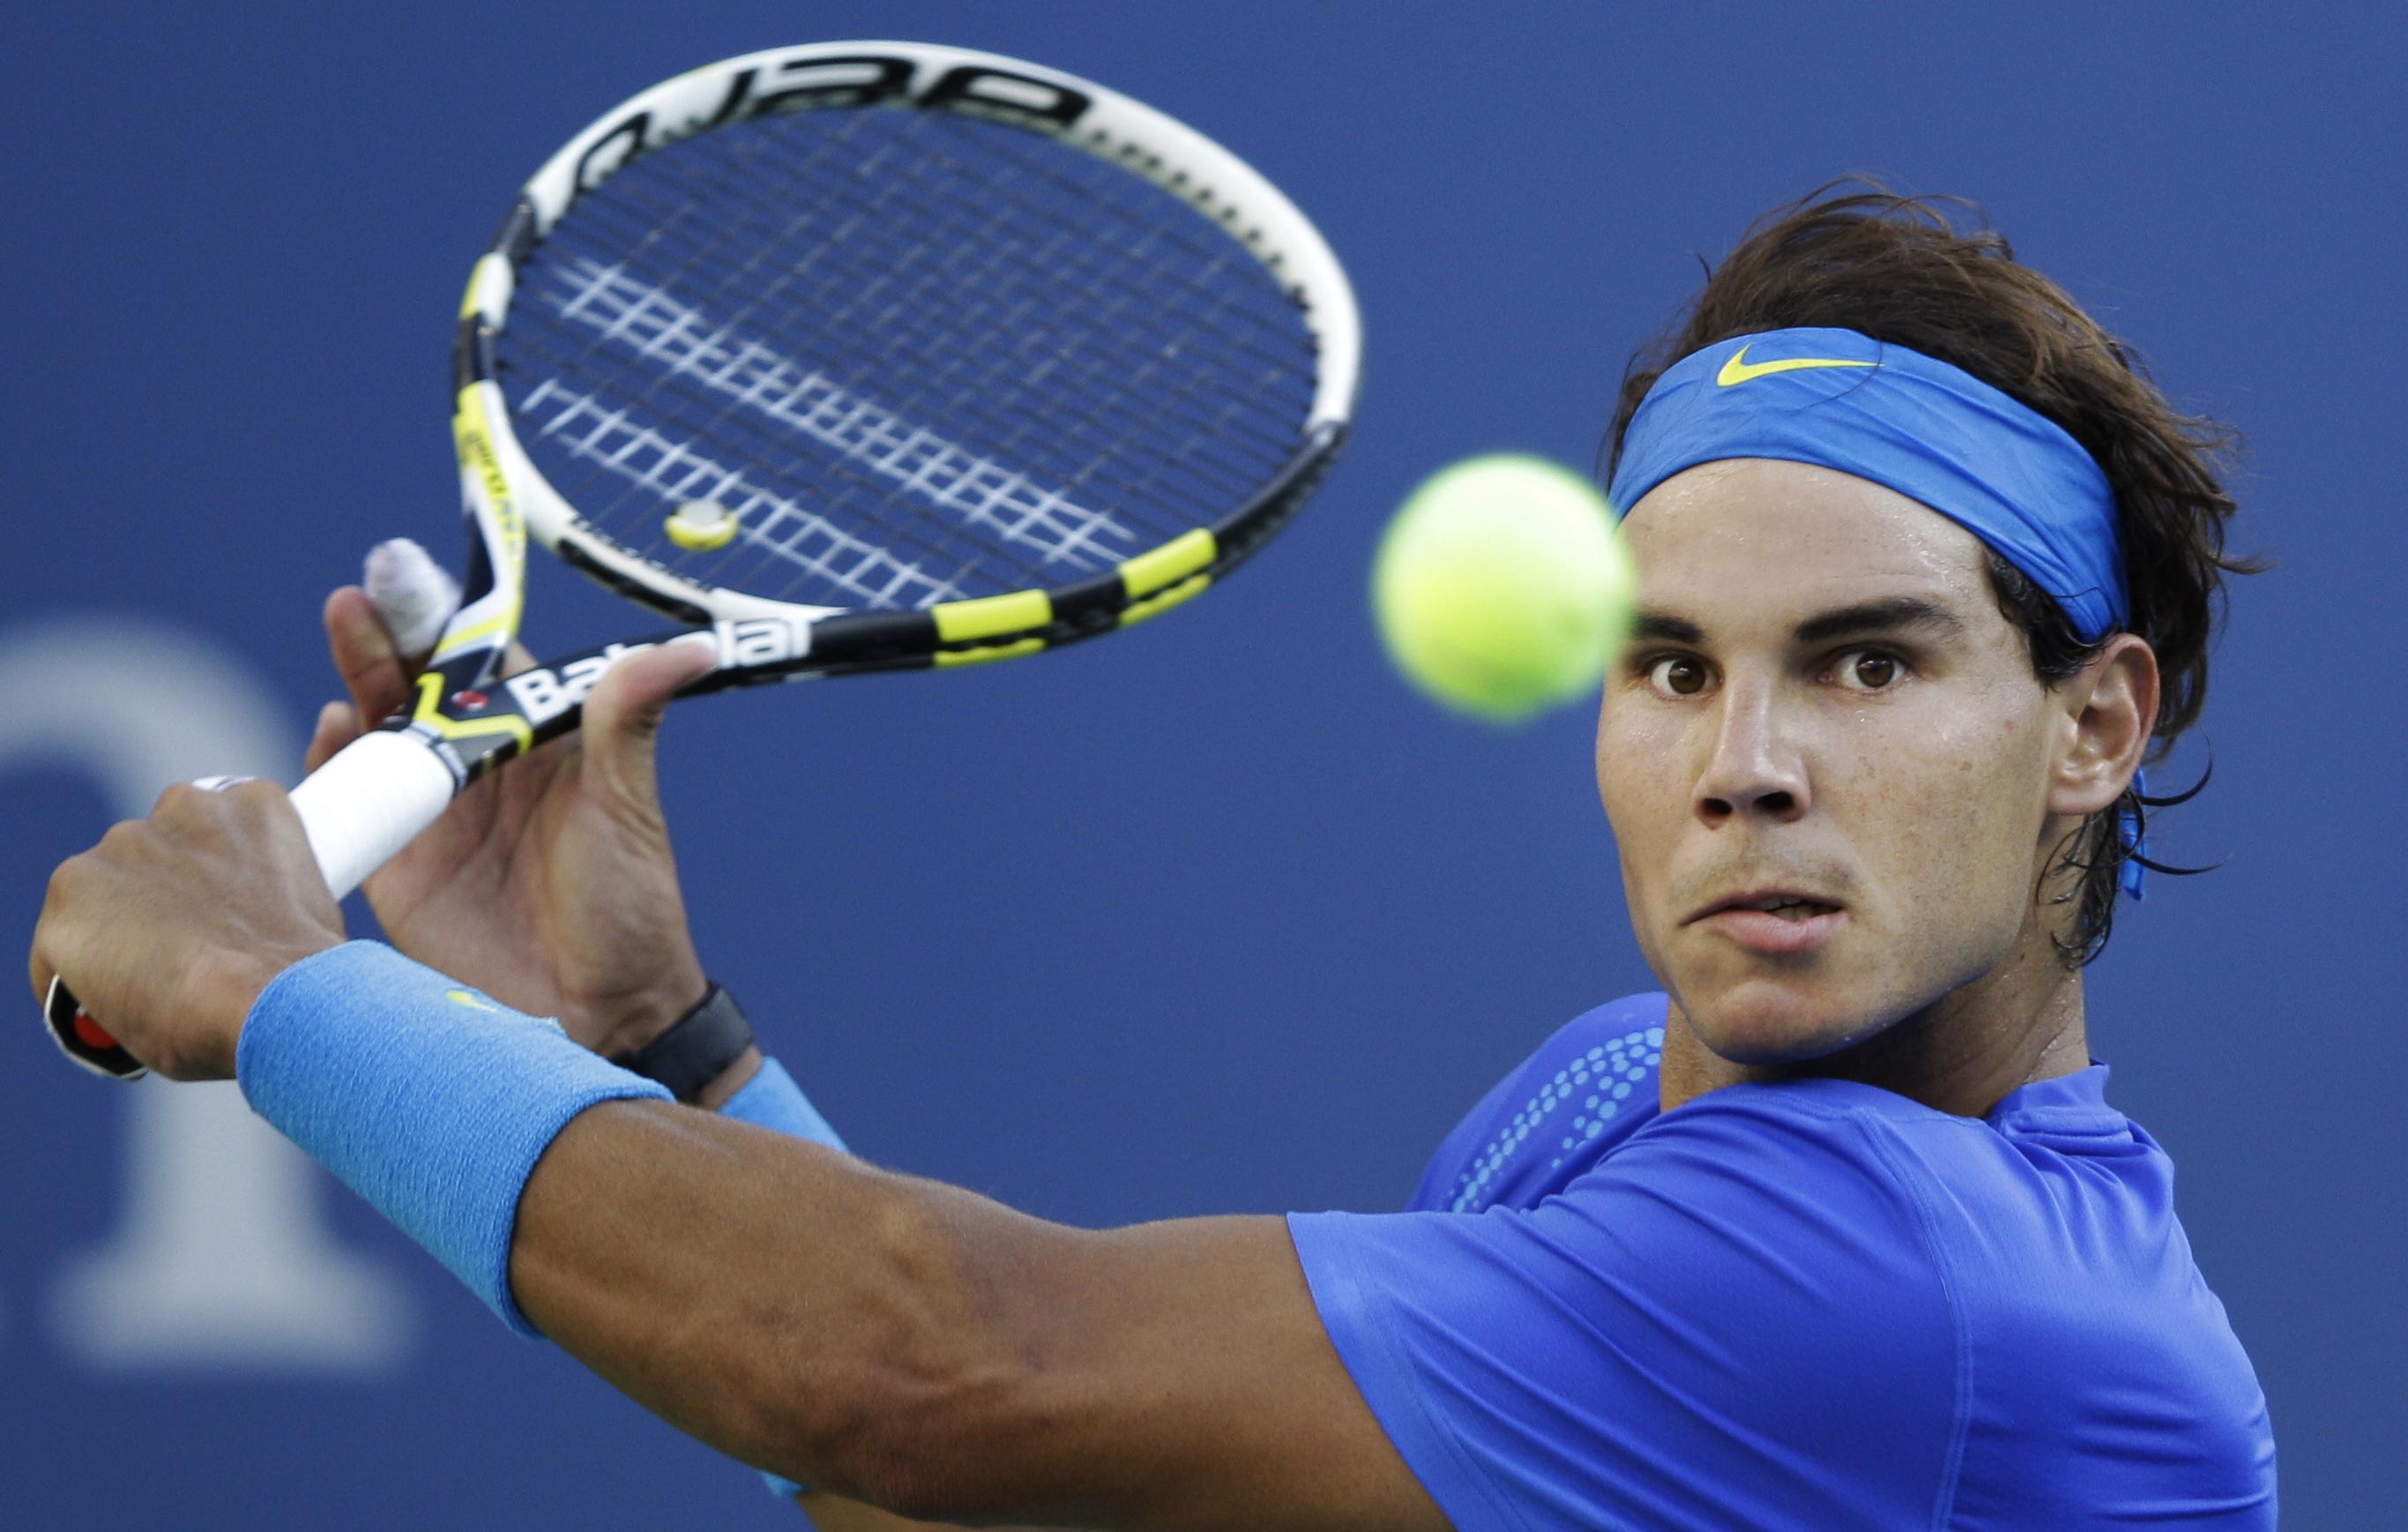 Rafael-Nadal-a-été-battu-en-demi-finales-à-Rio.